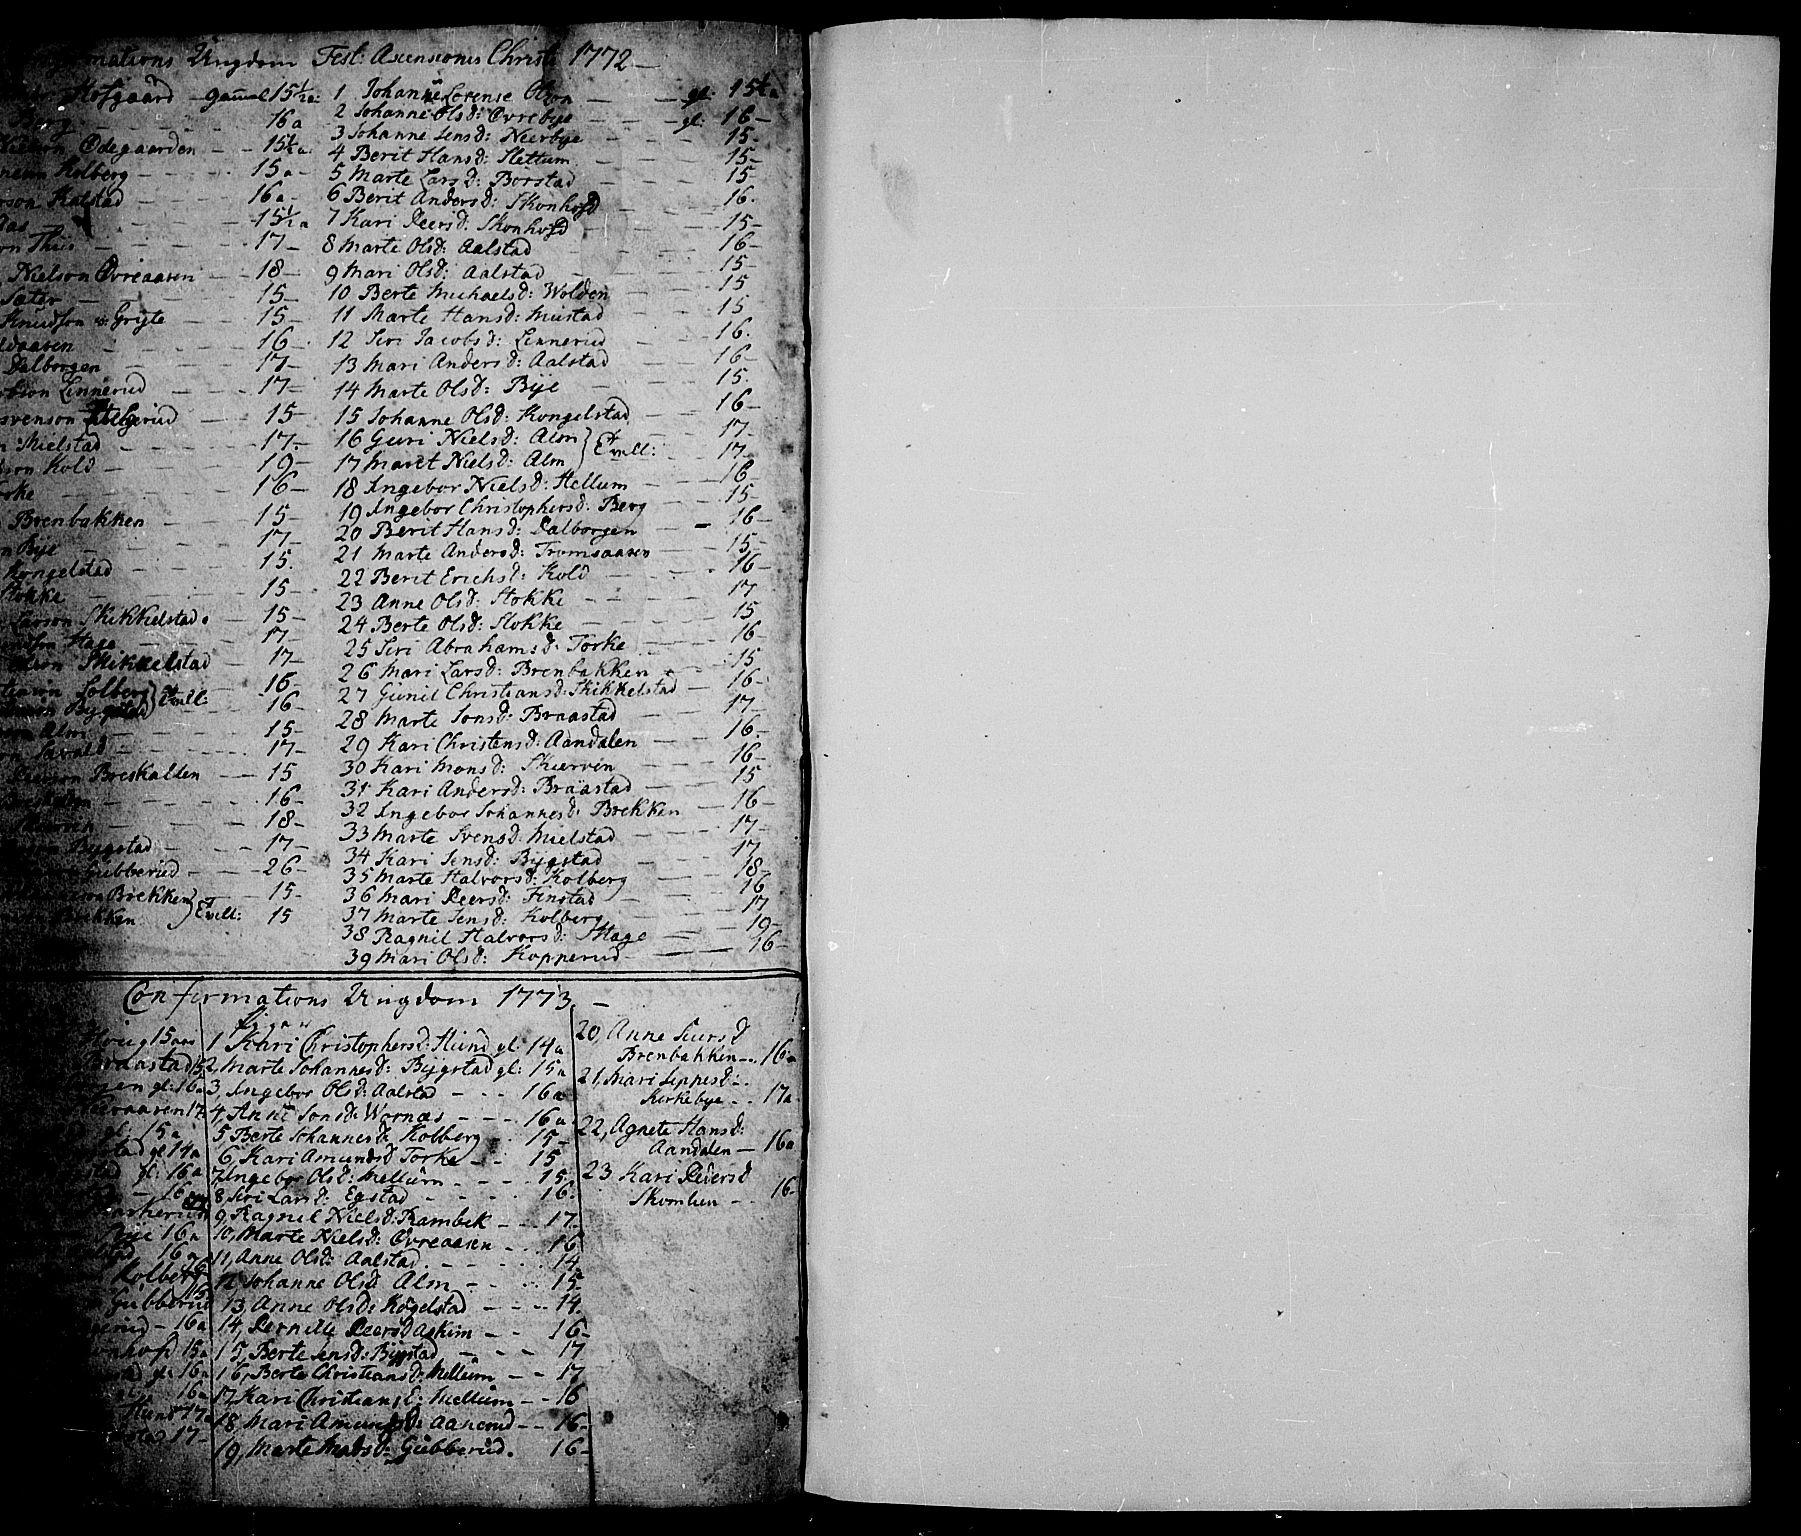 SAH, Vardal prestekontor, H/Ha/Haa/L0002: Ministerialbok nr. 2, 1748-1776, s. 178-179